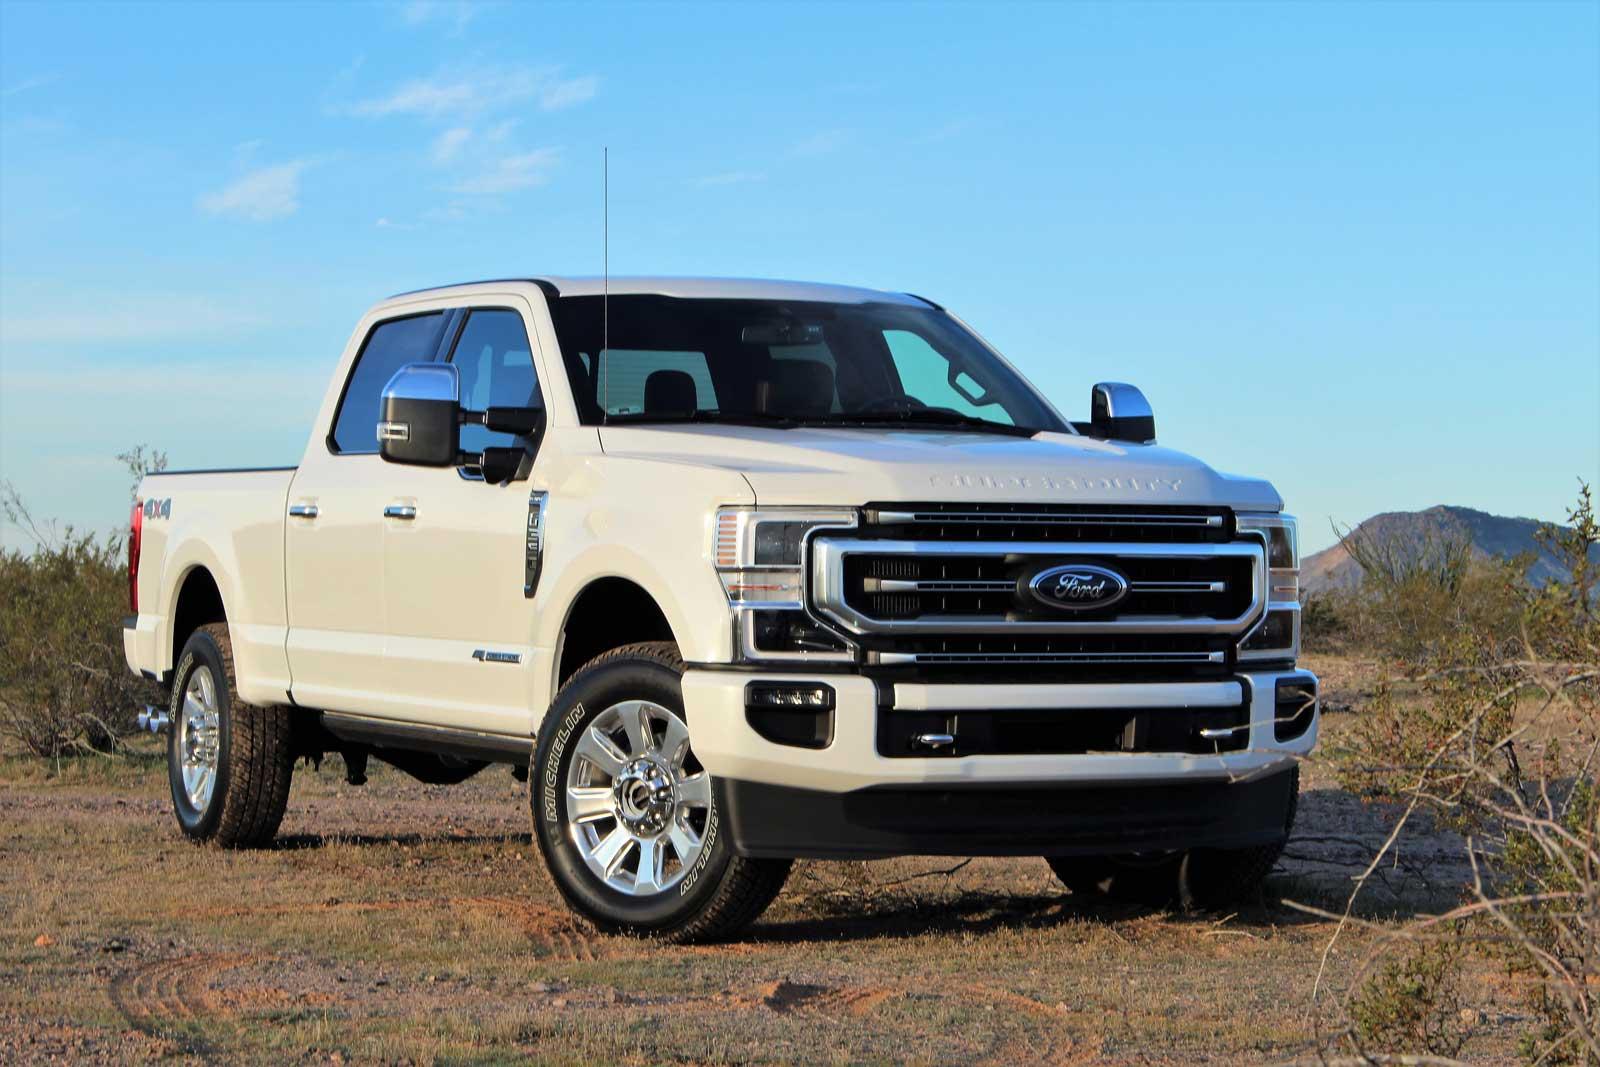 2020 Ford Super Duty: Realtruck - Motor Illustrated